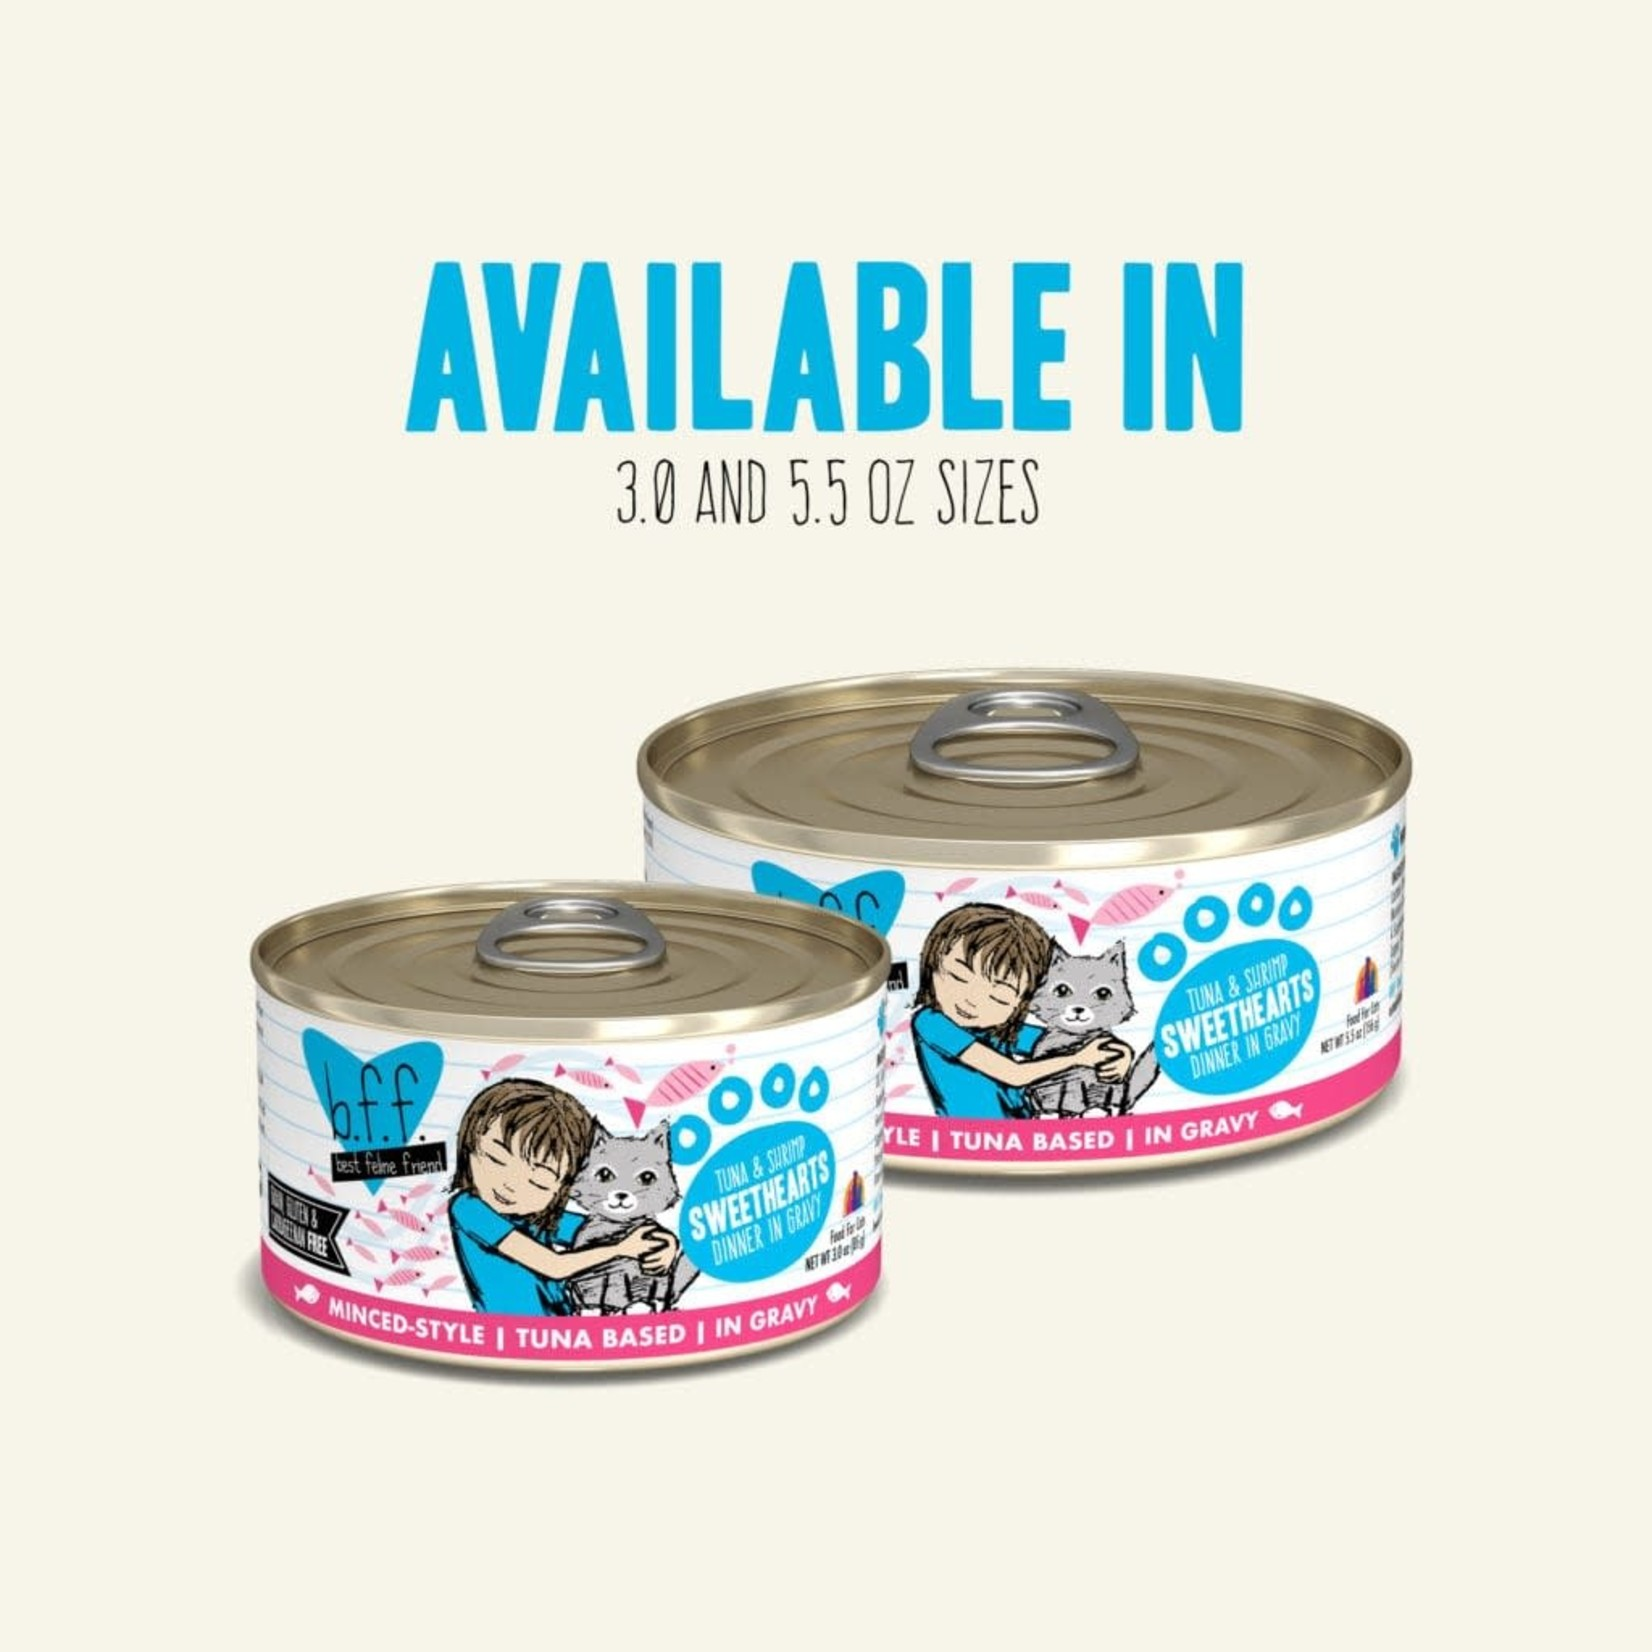 Weruva Inc. BFF Cat Tuna & Shrimp Sweethearts 5.5 OZ